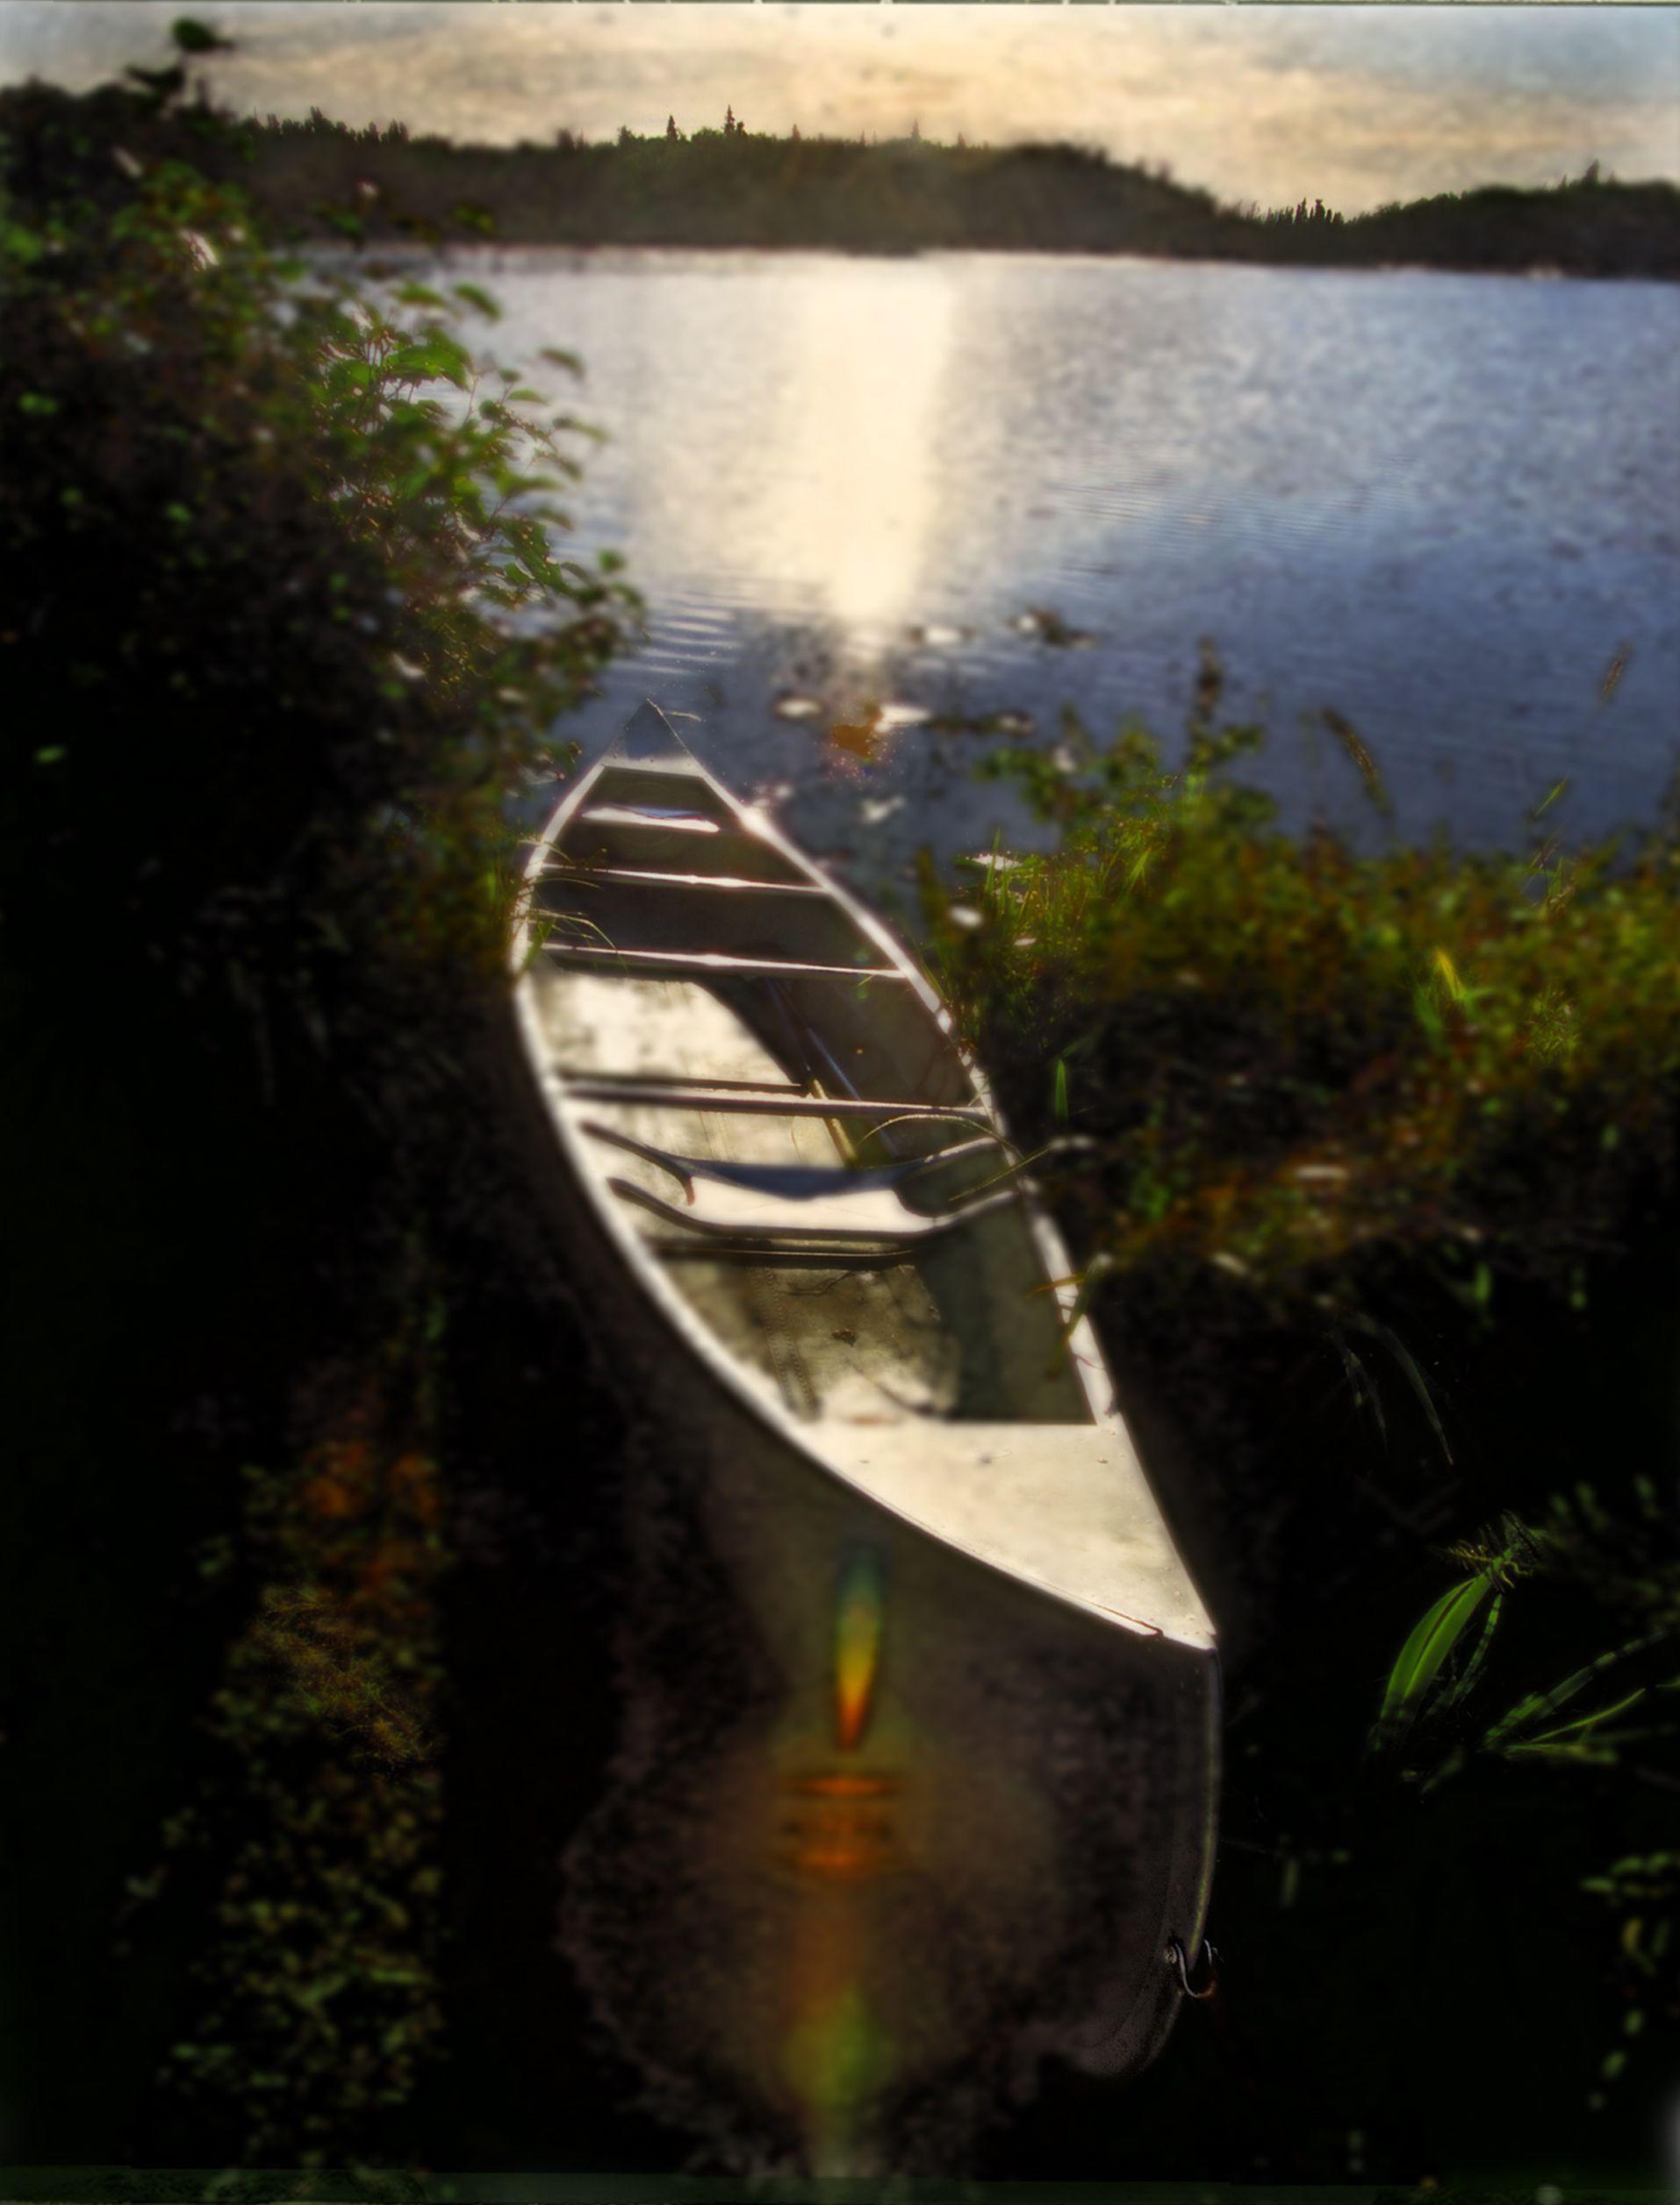 Tippy Canoe / Alaska